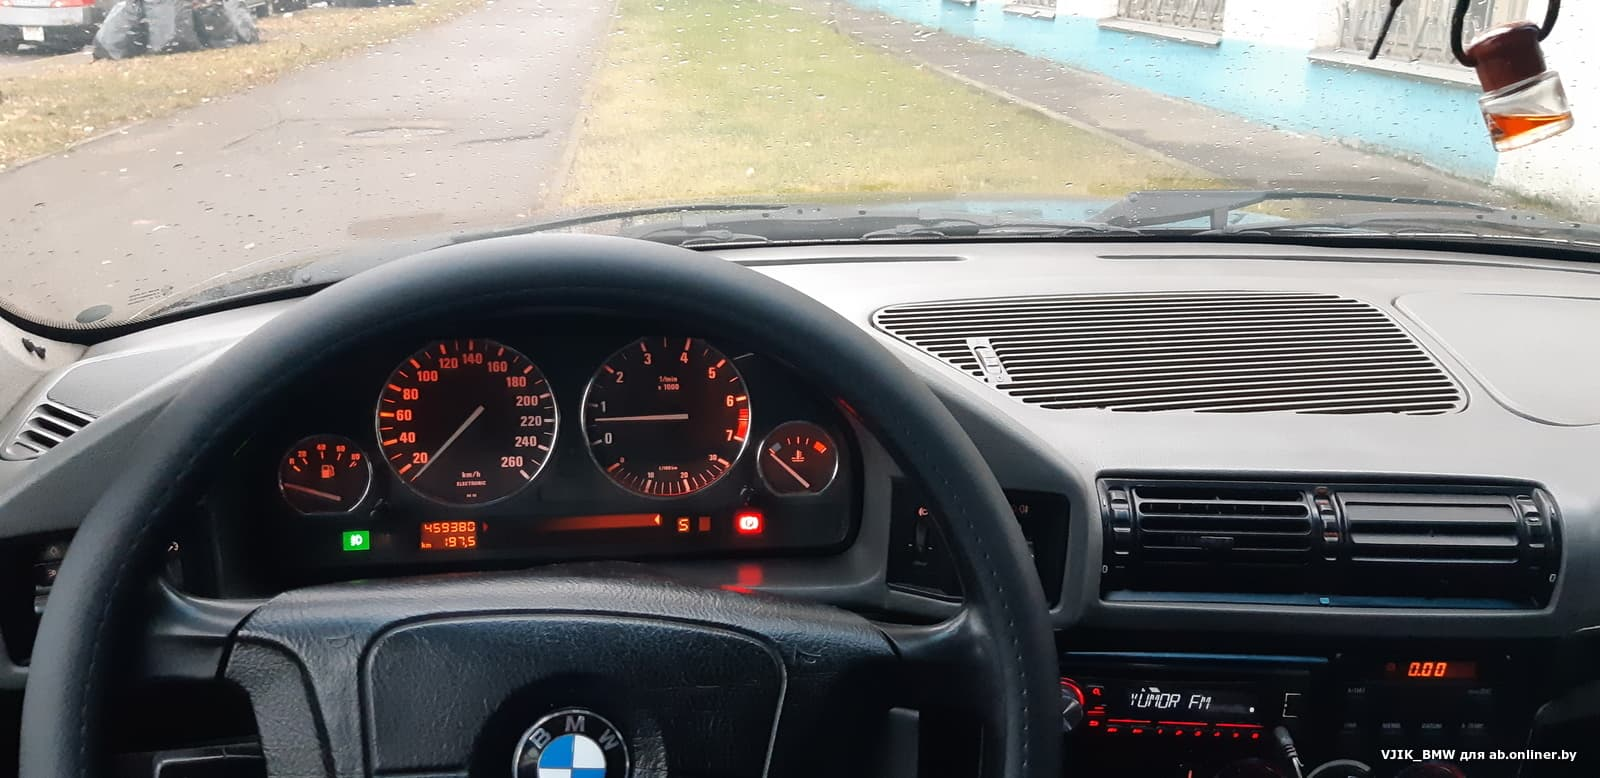 BMW 525 M50B25